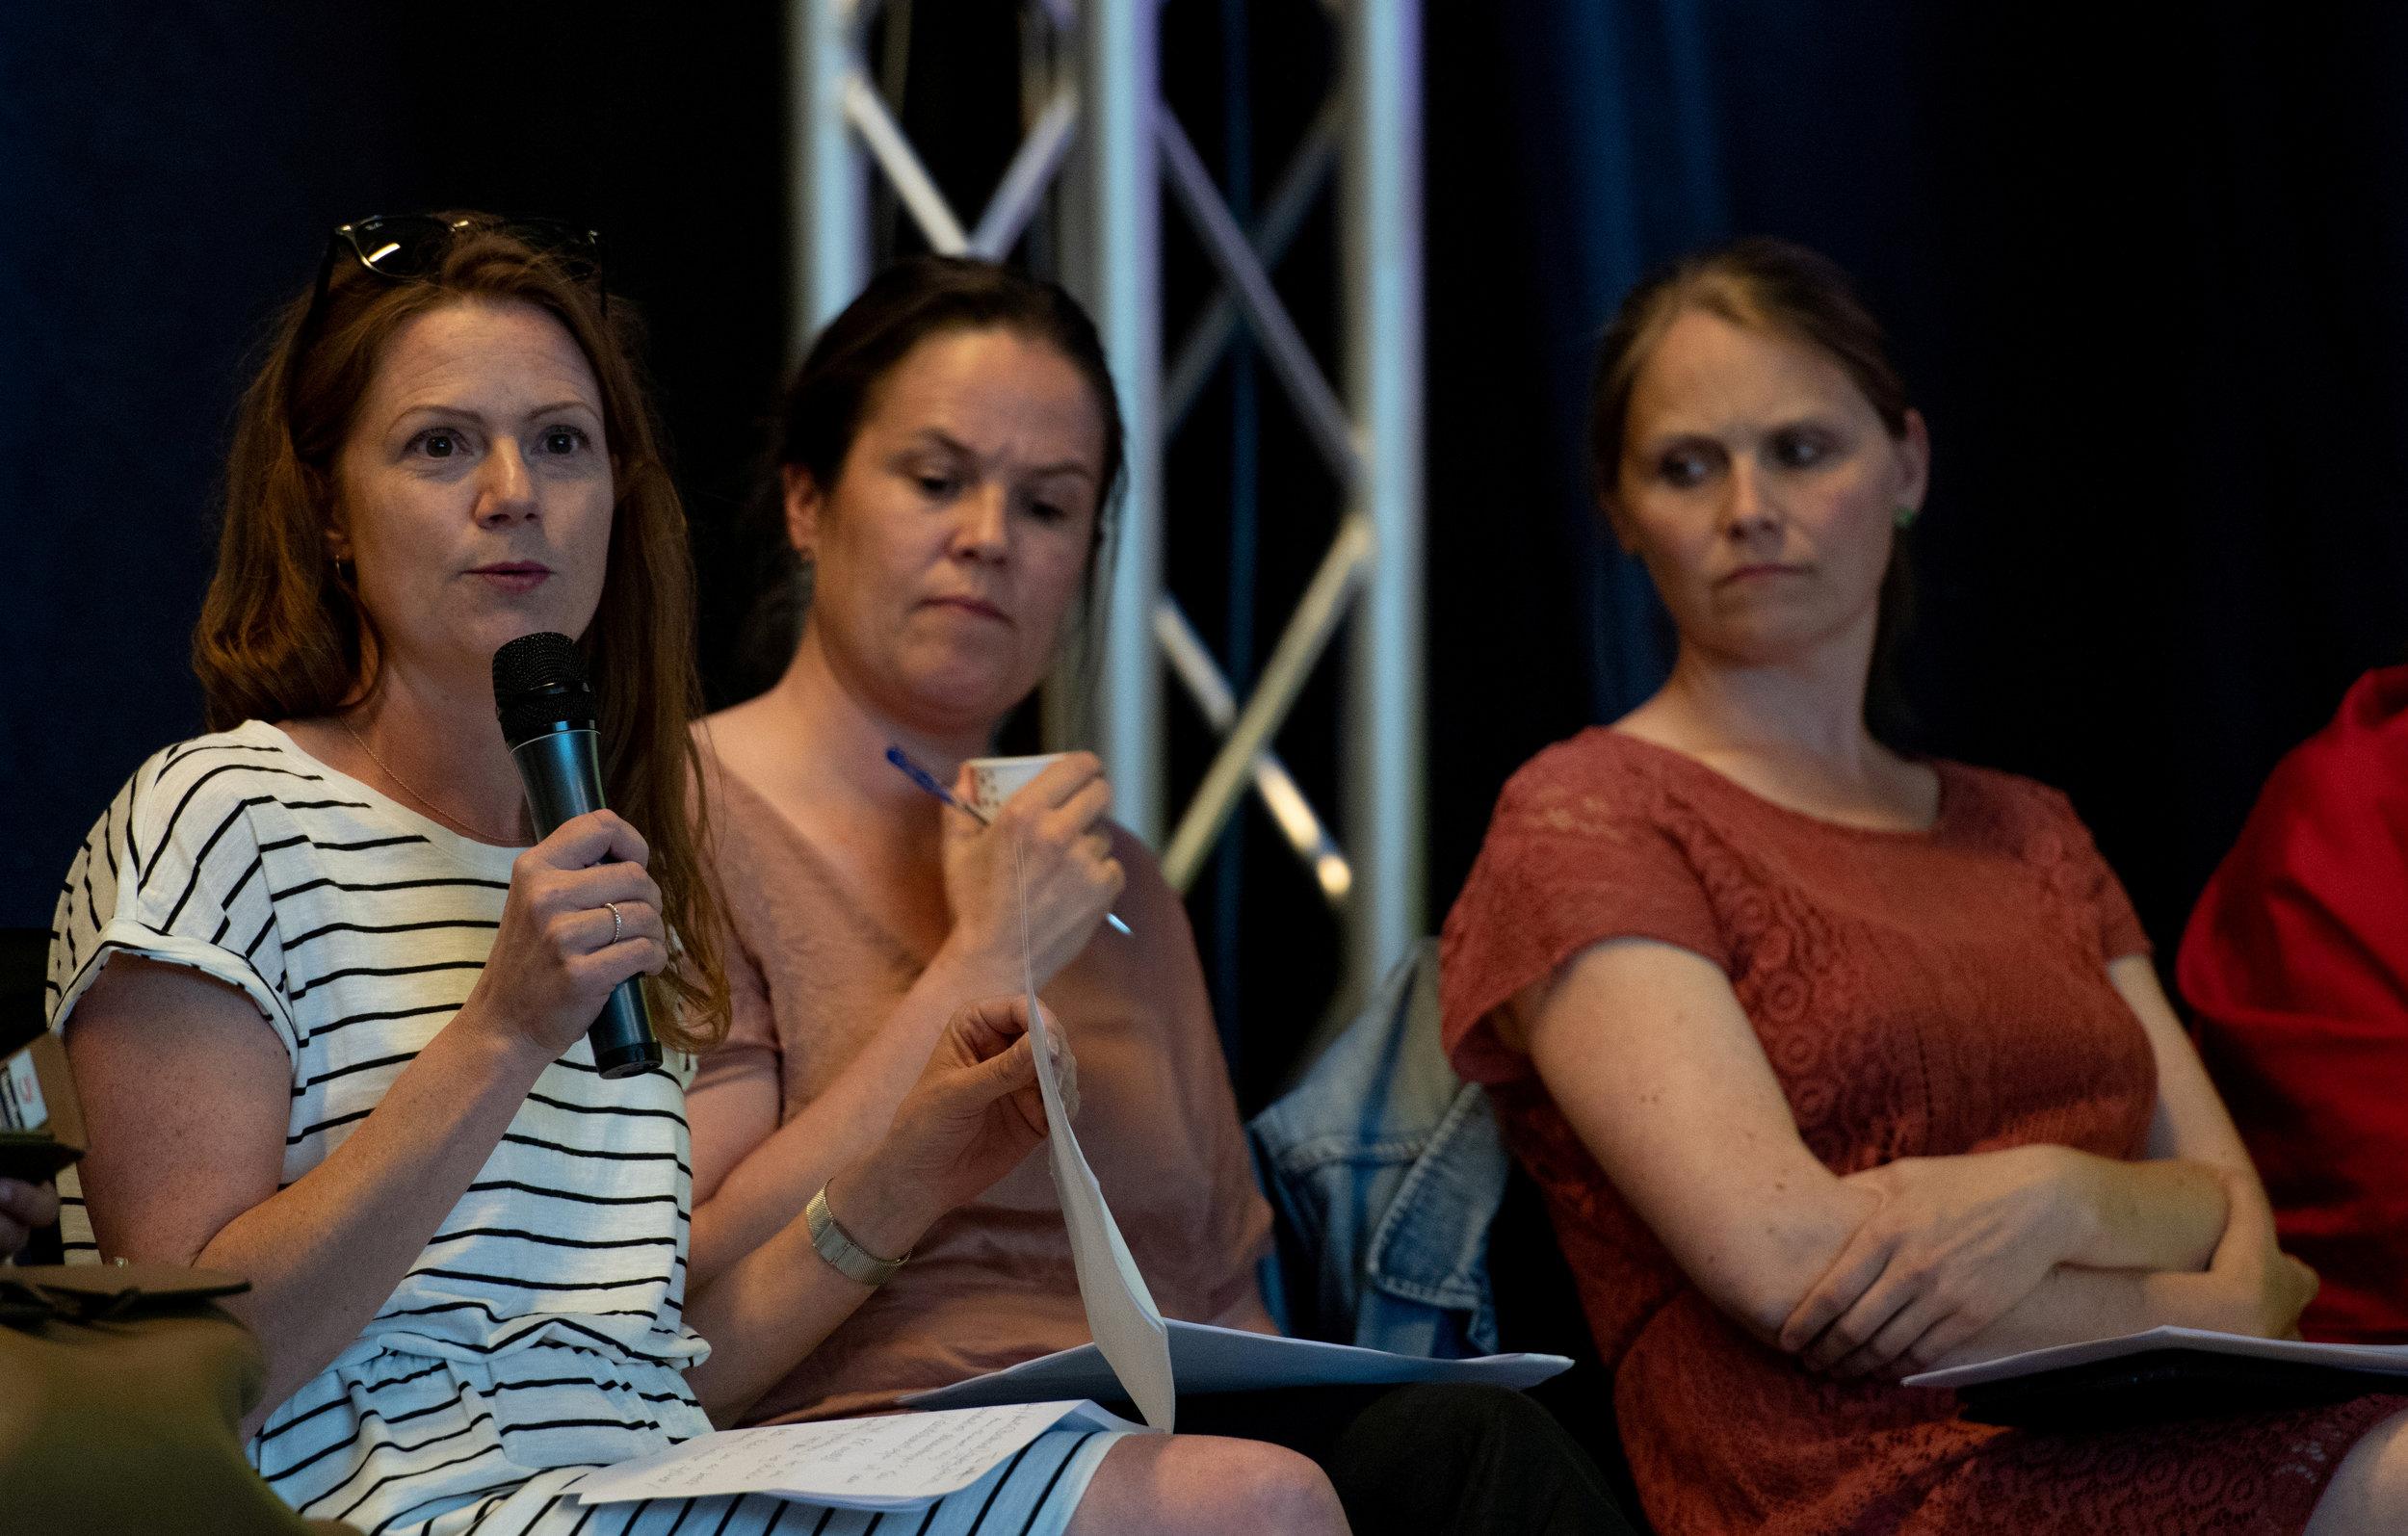 Lil Carin Jacobsen fra Buskerud fortalte om utfordringer knyttet til det smale versus det populære og ekstroverte tilbudet i DKS